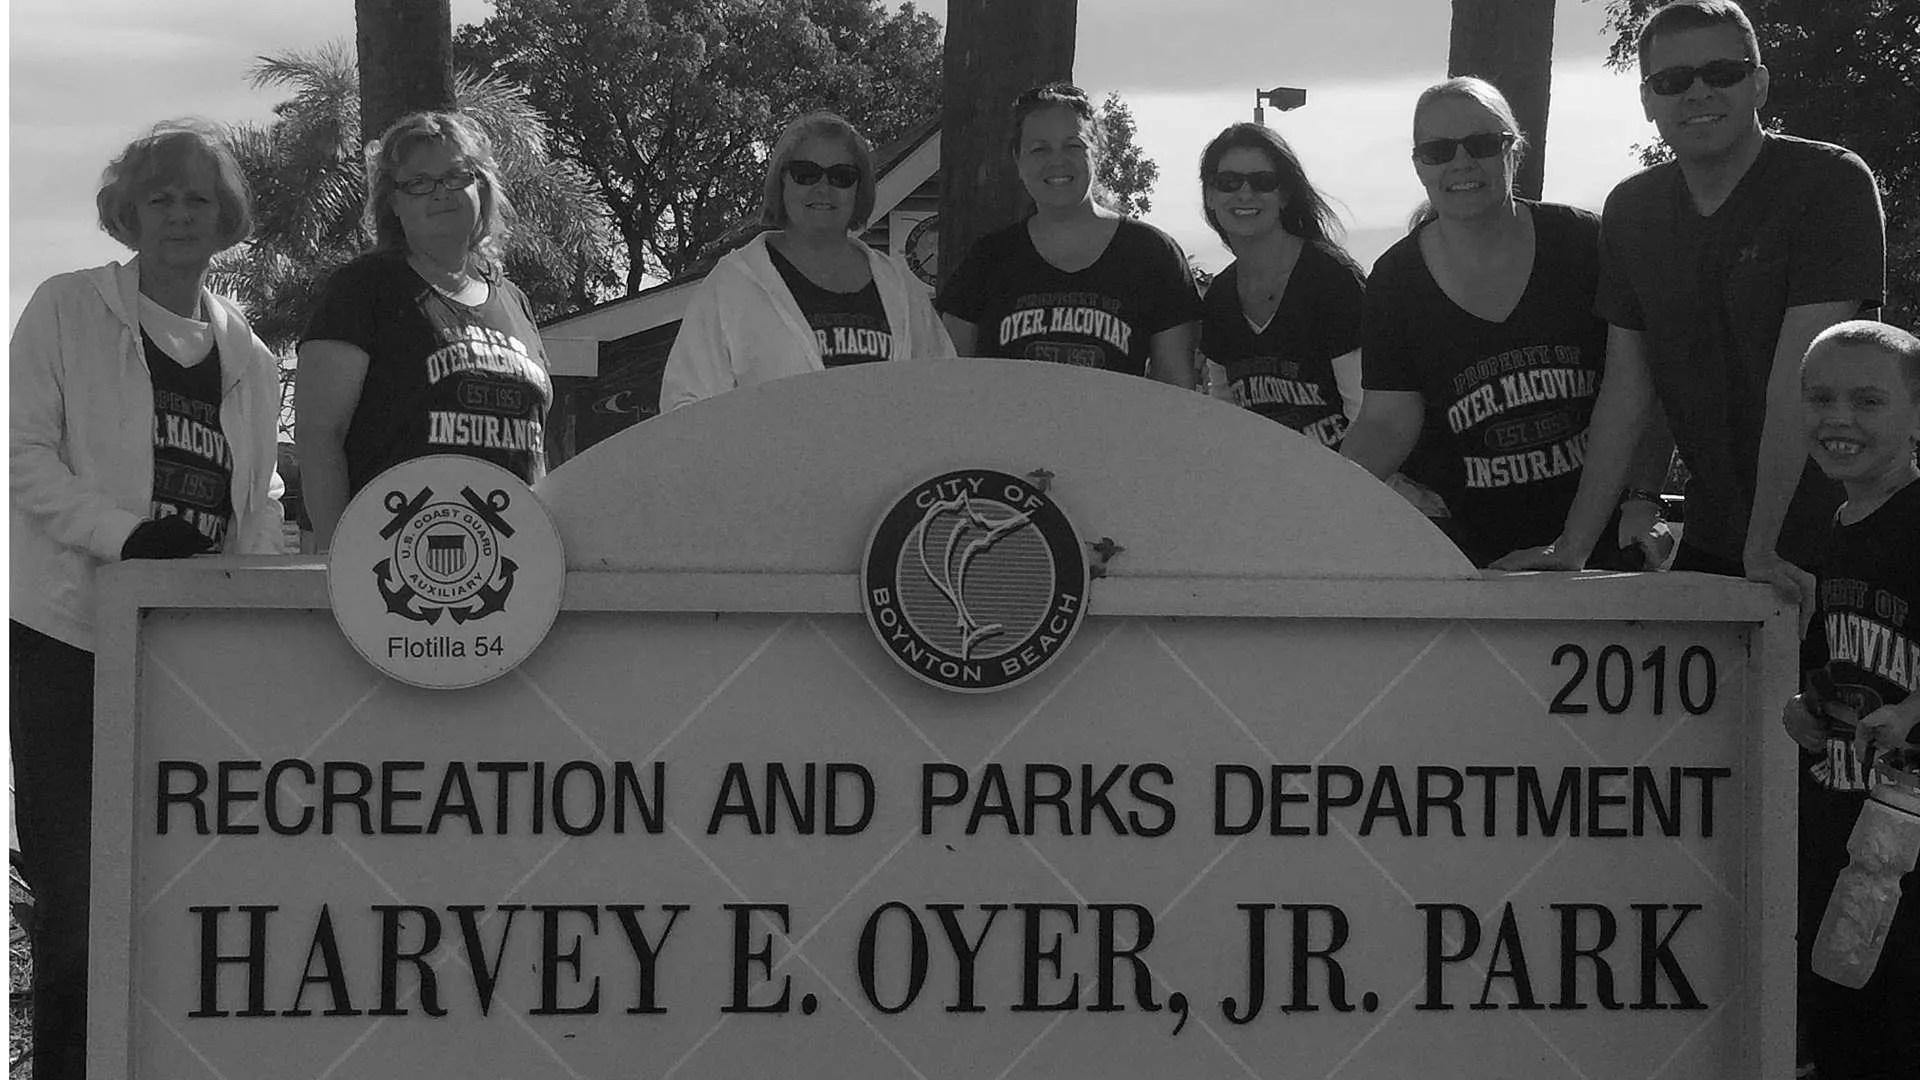 Harvey Oyer Park Oyer, Macoviak and Associates